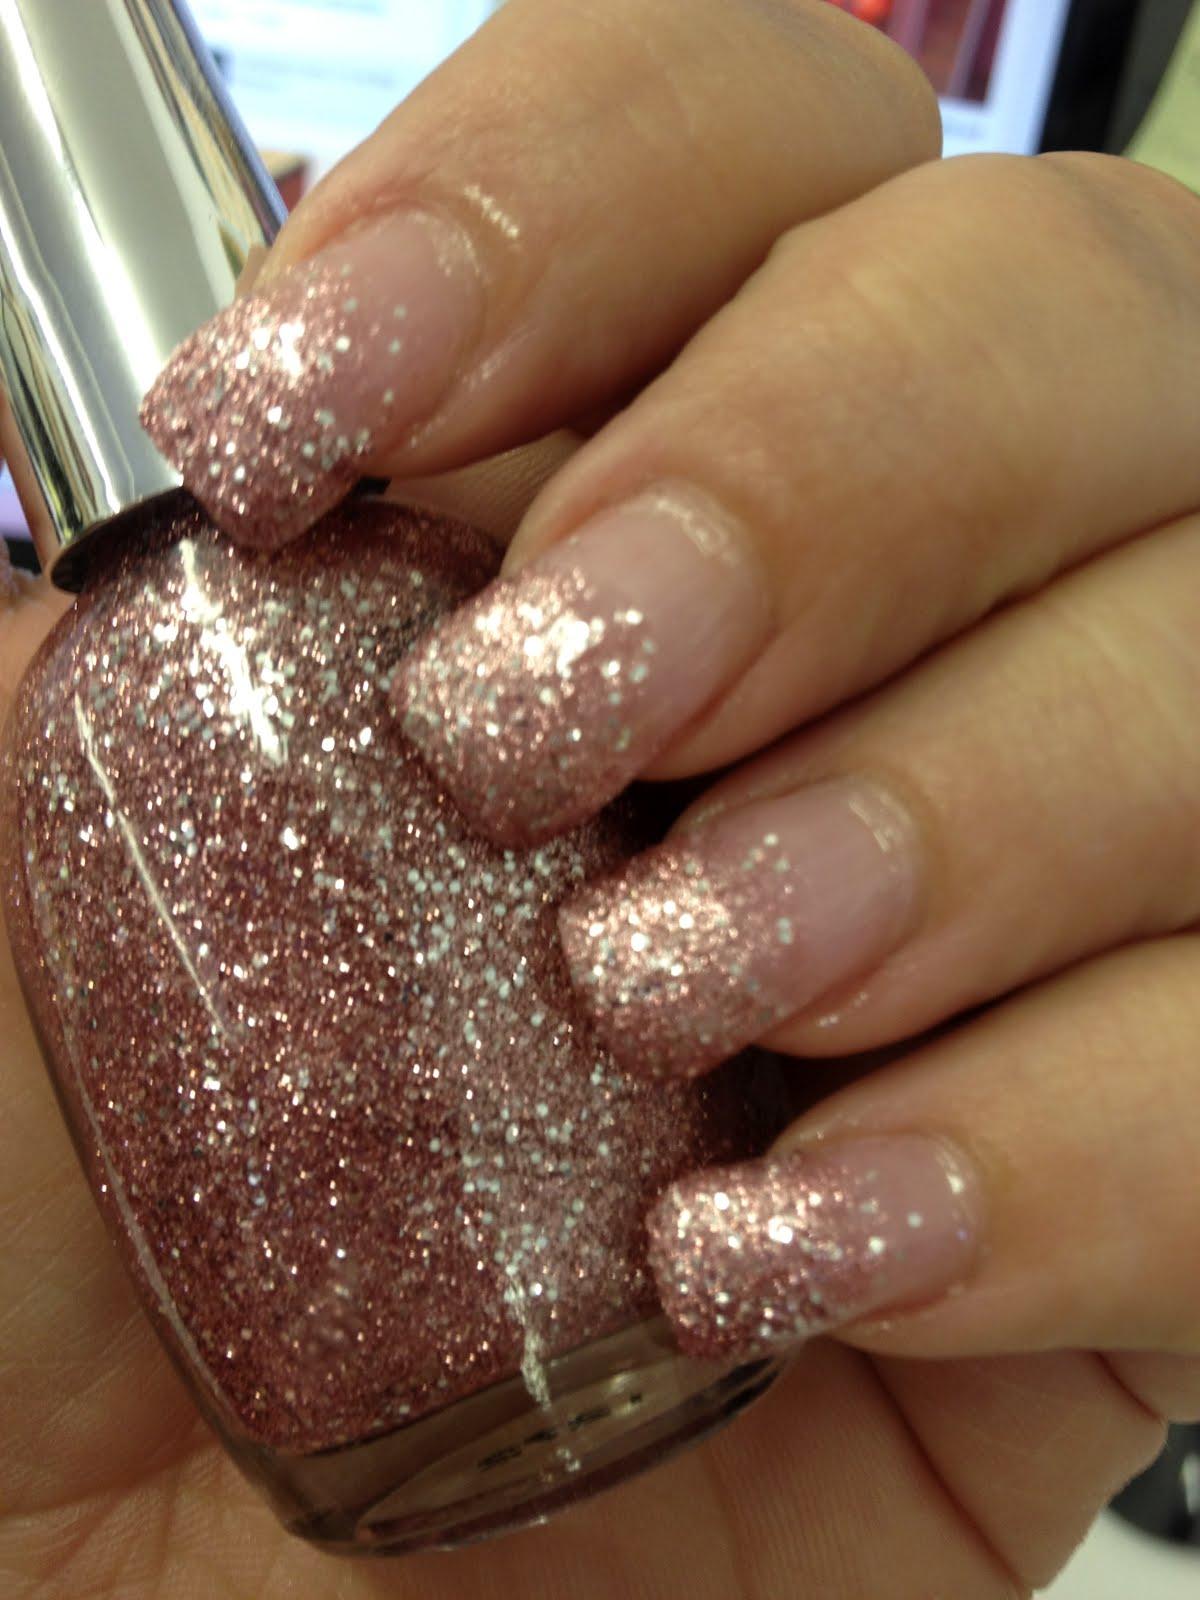 A Little Slice of Heaven: Ombre Glitter Nails...